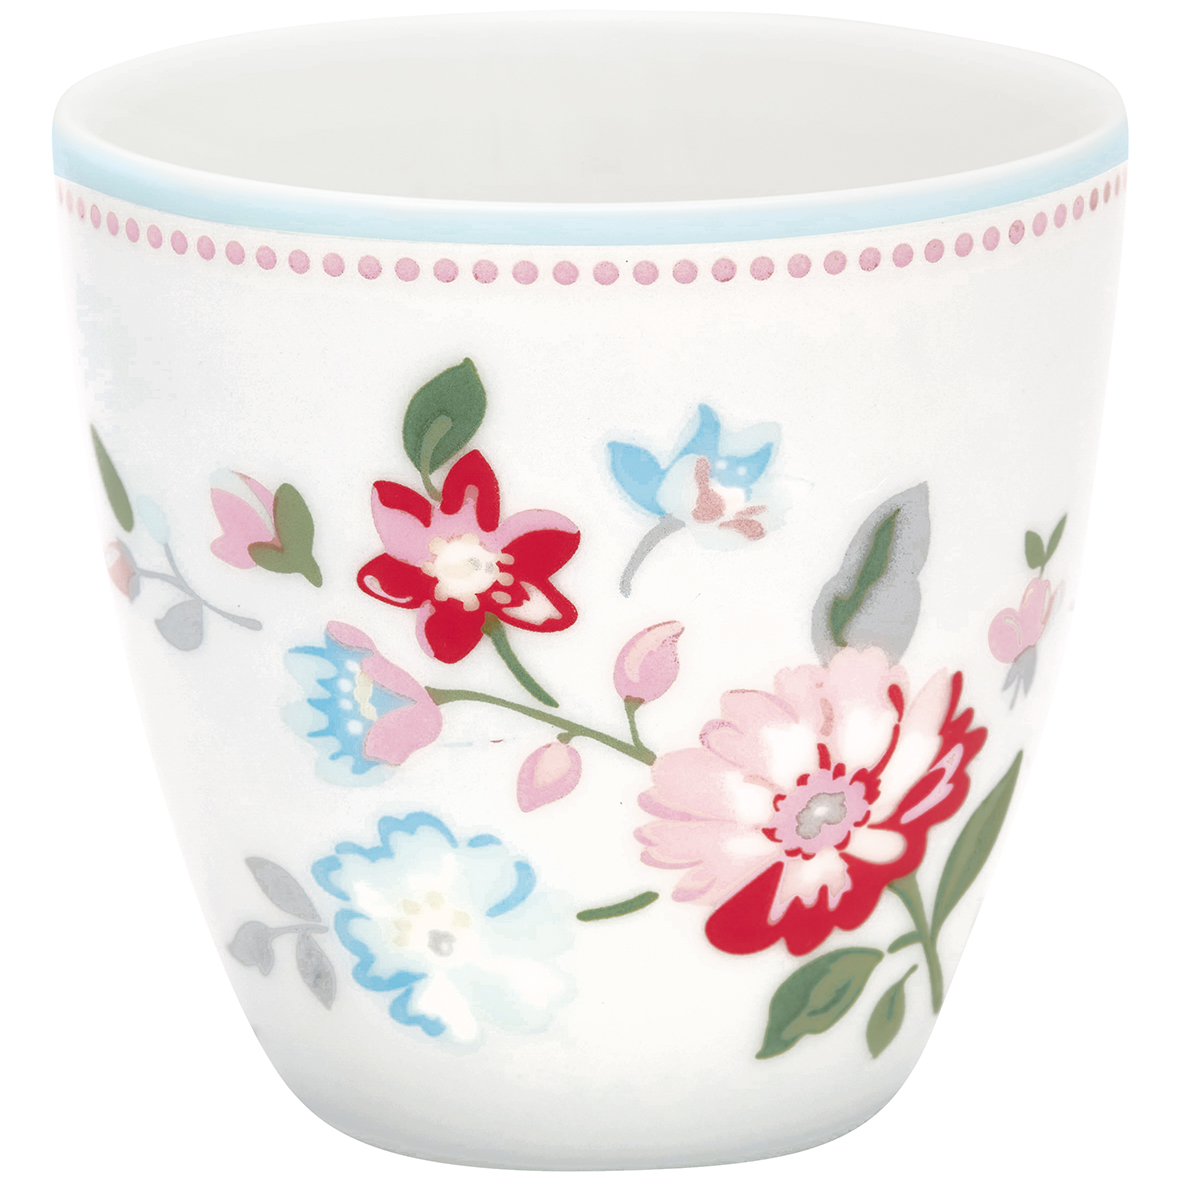 Espressotasse | Mini-Latte Cup - Sonia white - Greengate